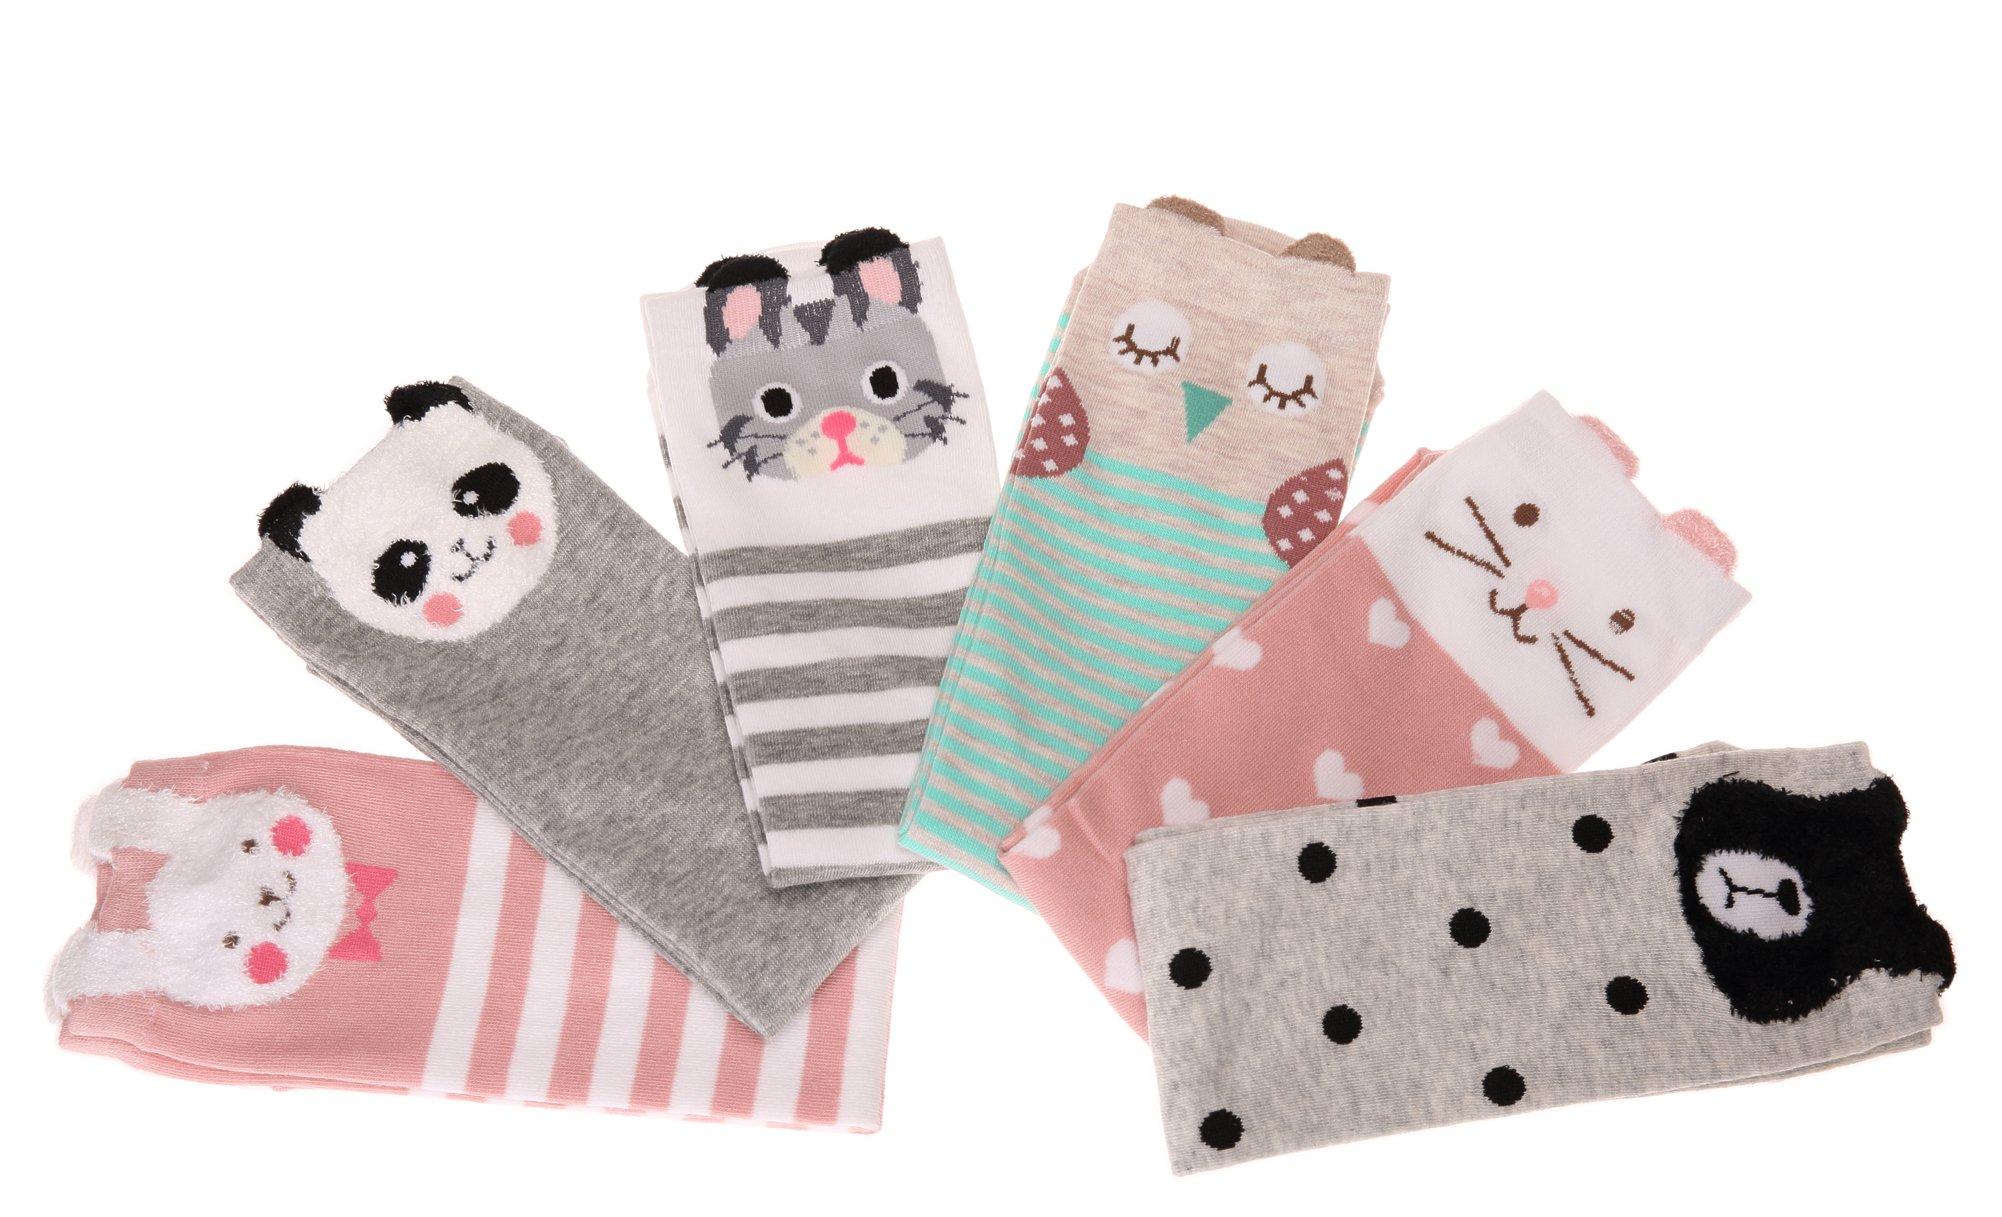 Color City Kids Girls Socks Knee High Stockings Cartoon Animal Theme Cotton Socks (6 Pairs) by Color City (Image #4)